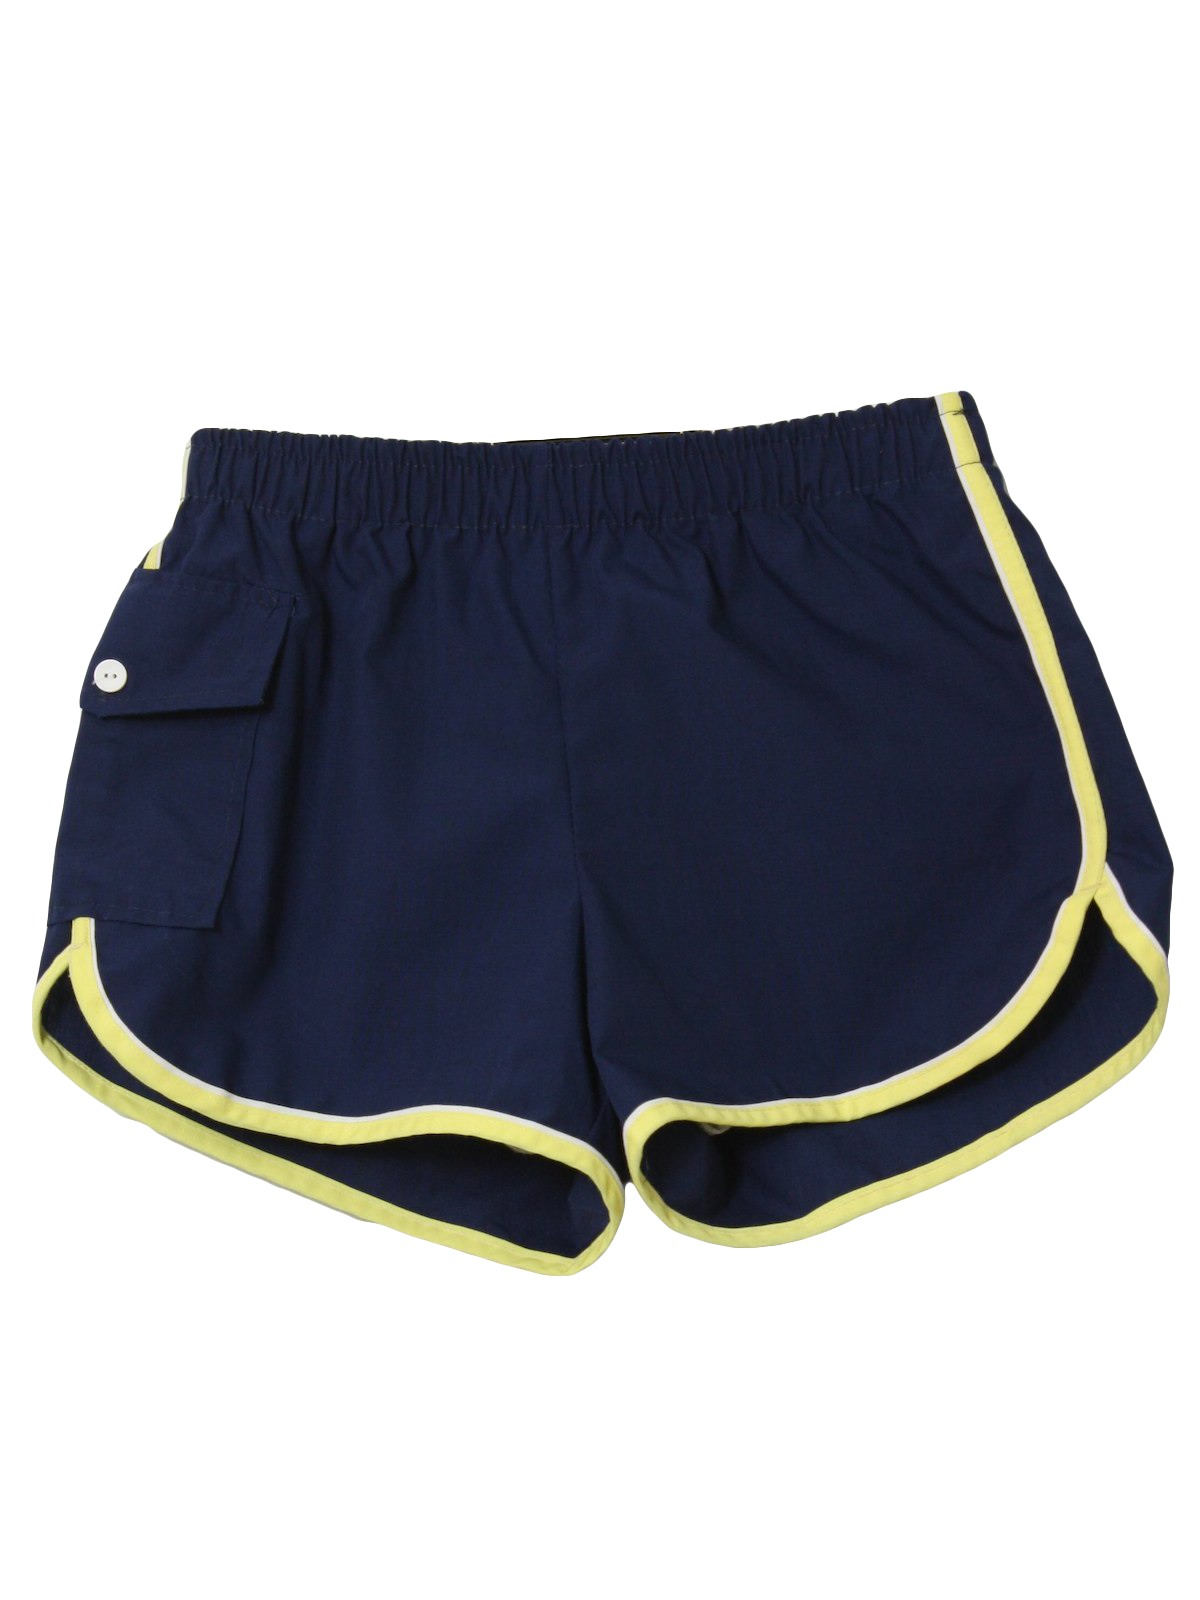 922c3758f0 80s Swimsuit/Swimwear: 80s -styled in California JCPenney- Mens dark ...